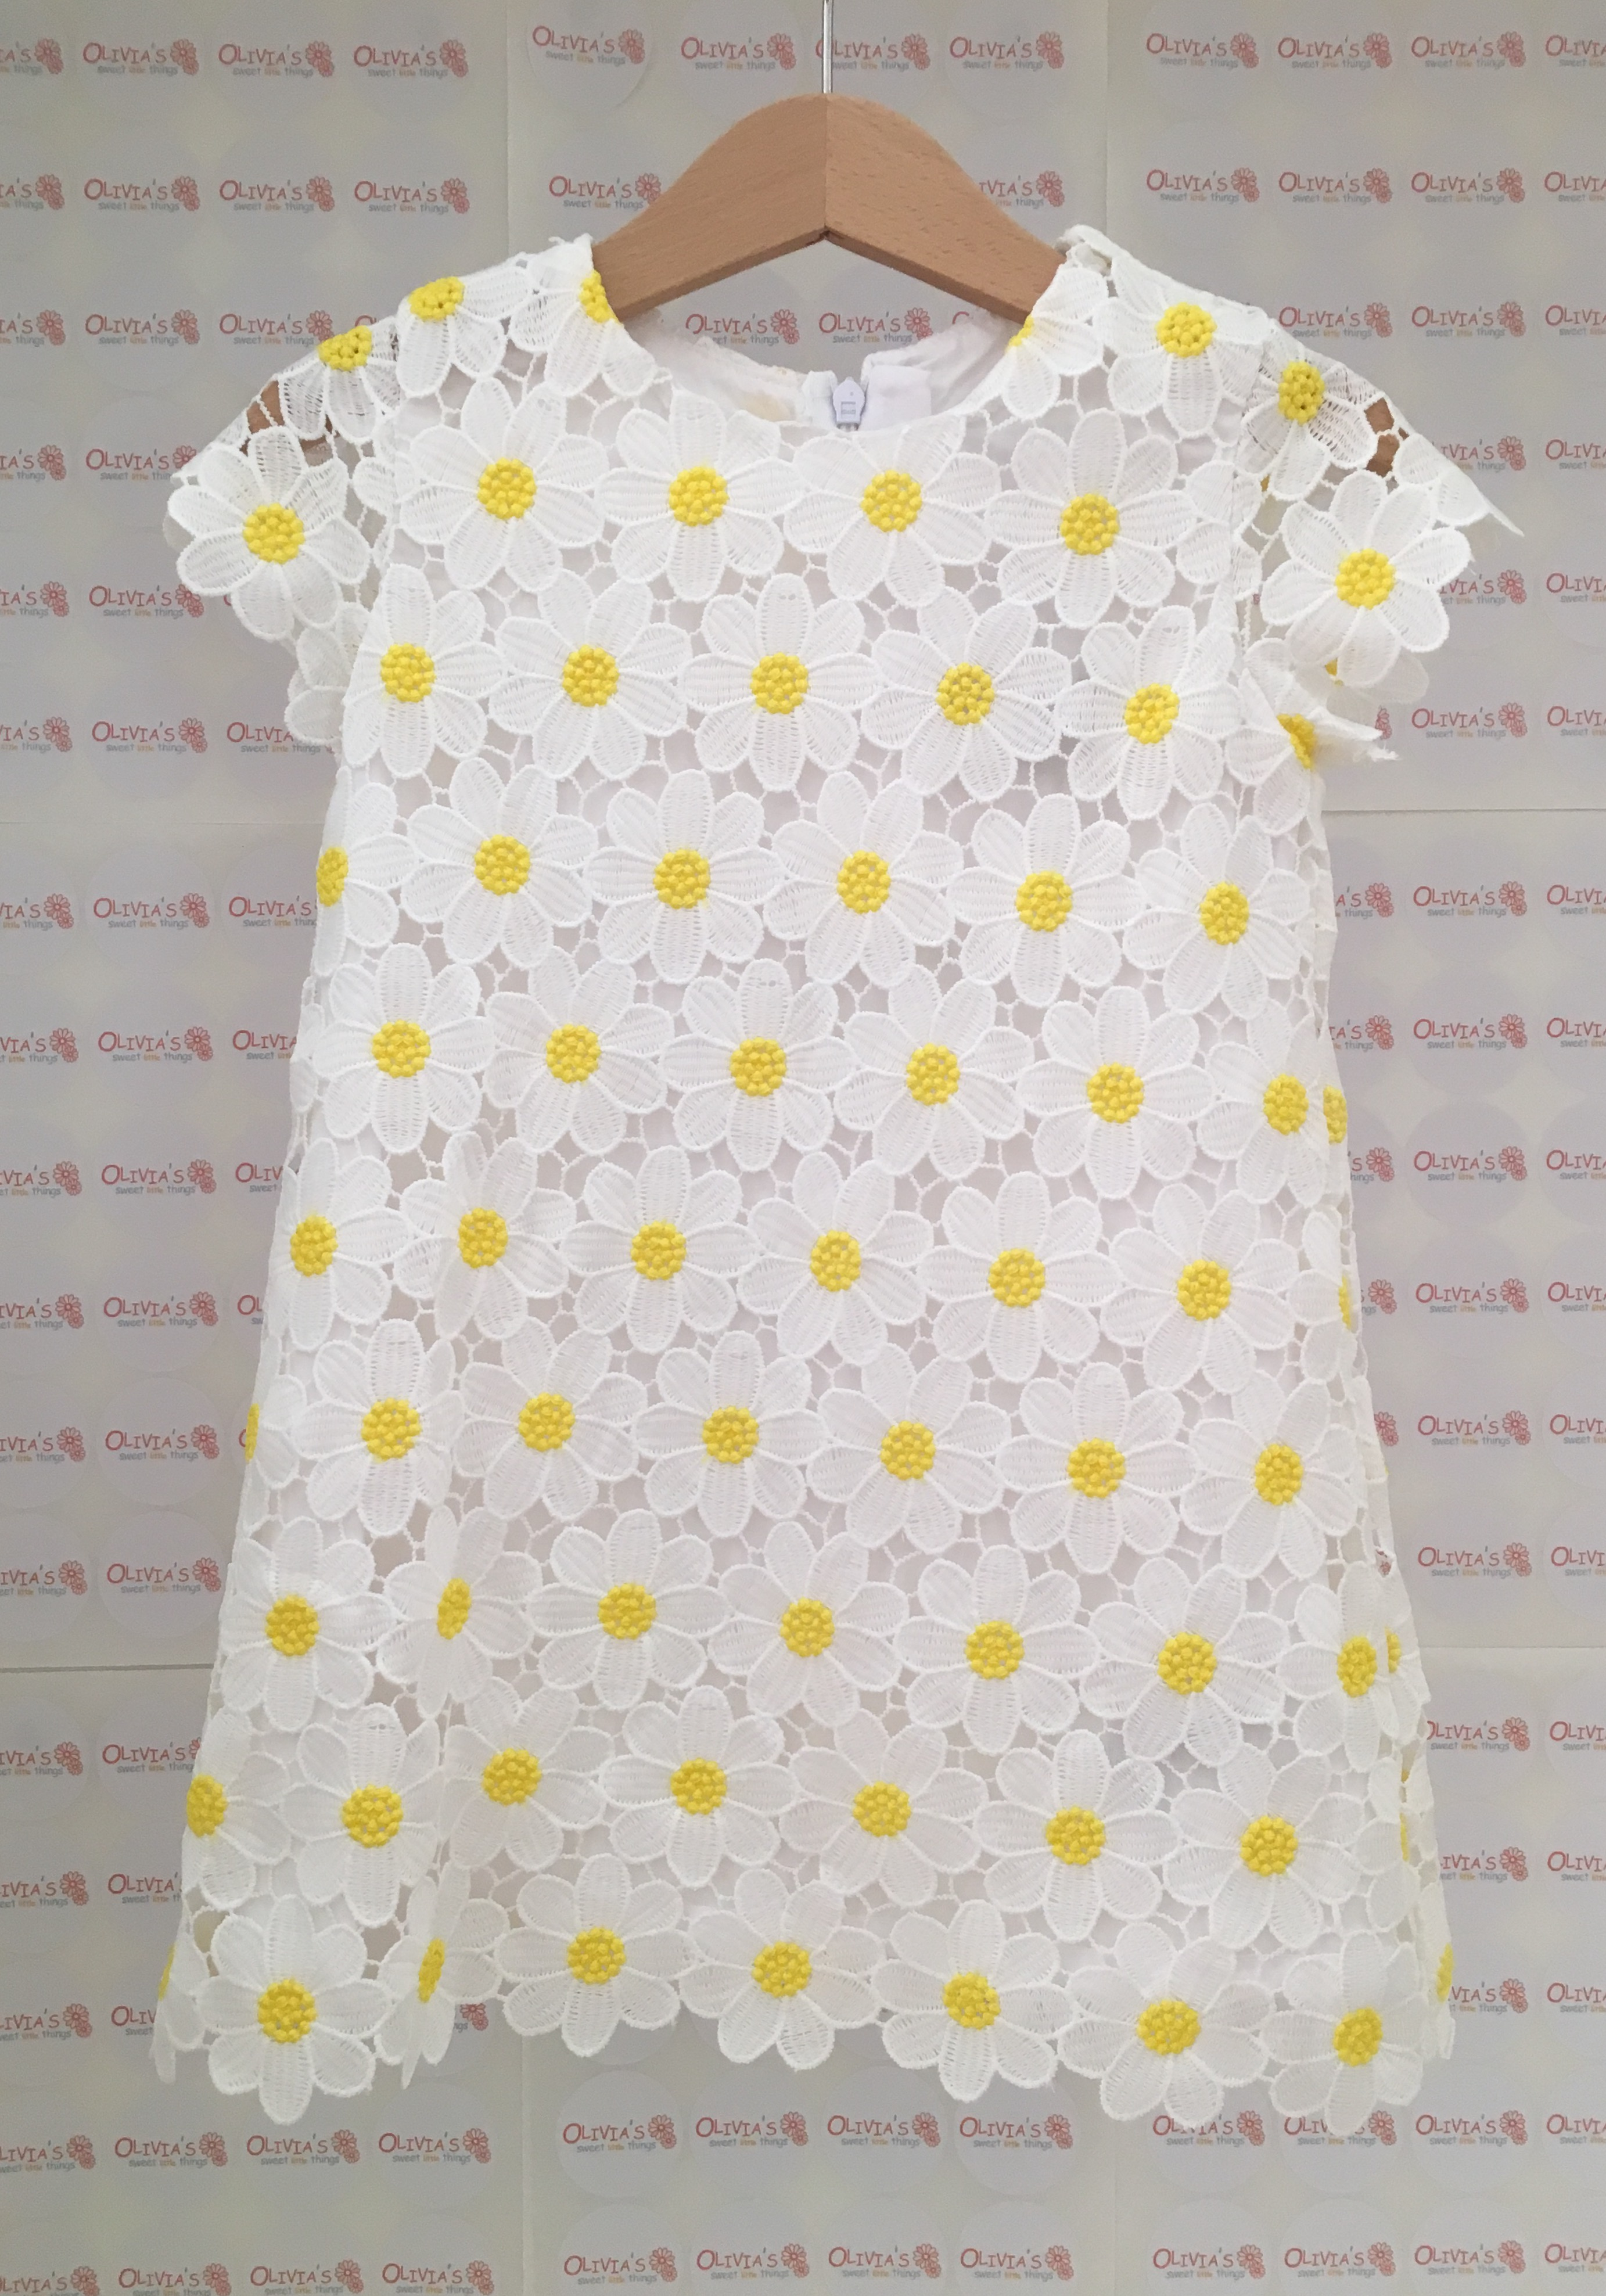 b9182e3219 Mayoral daisy lace dress